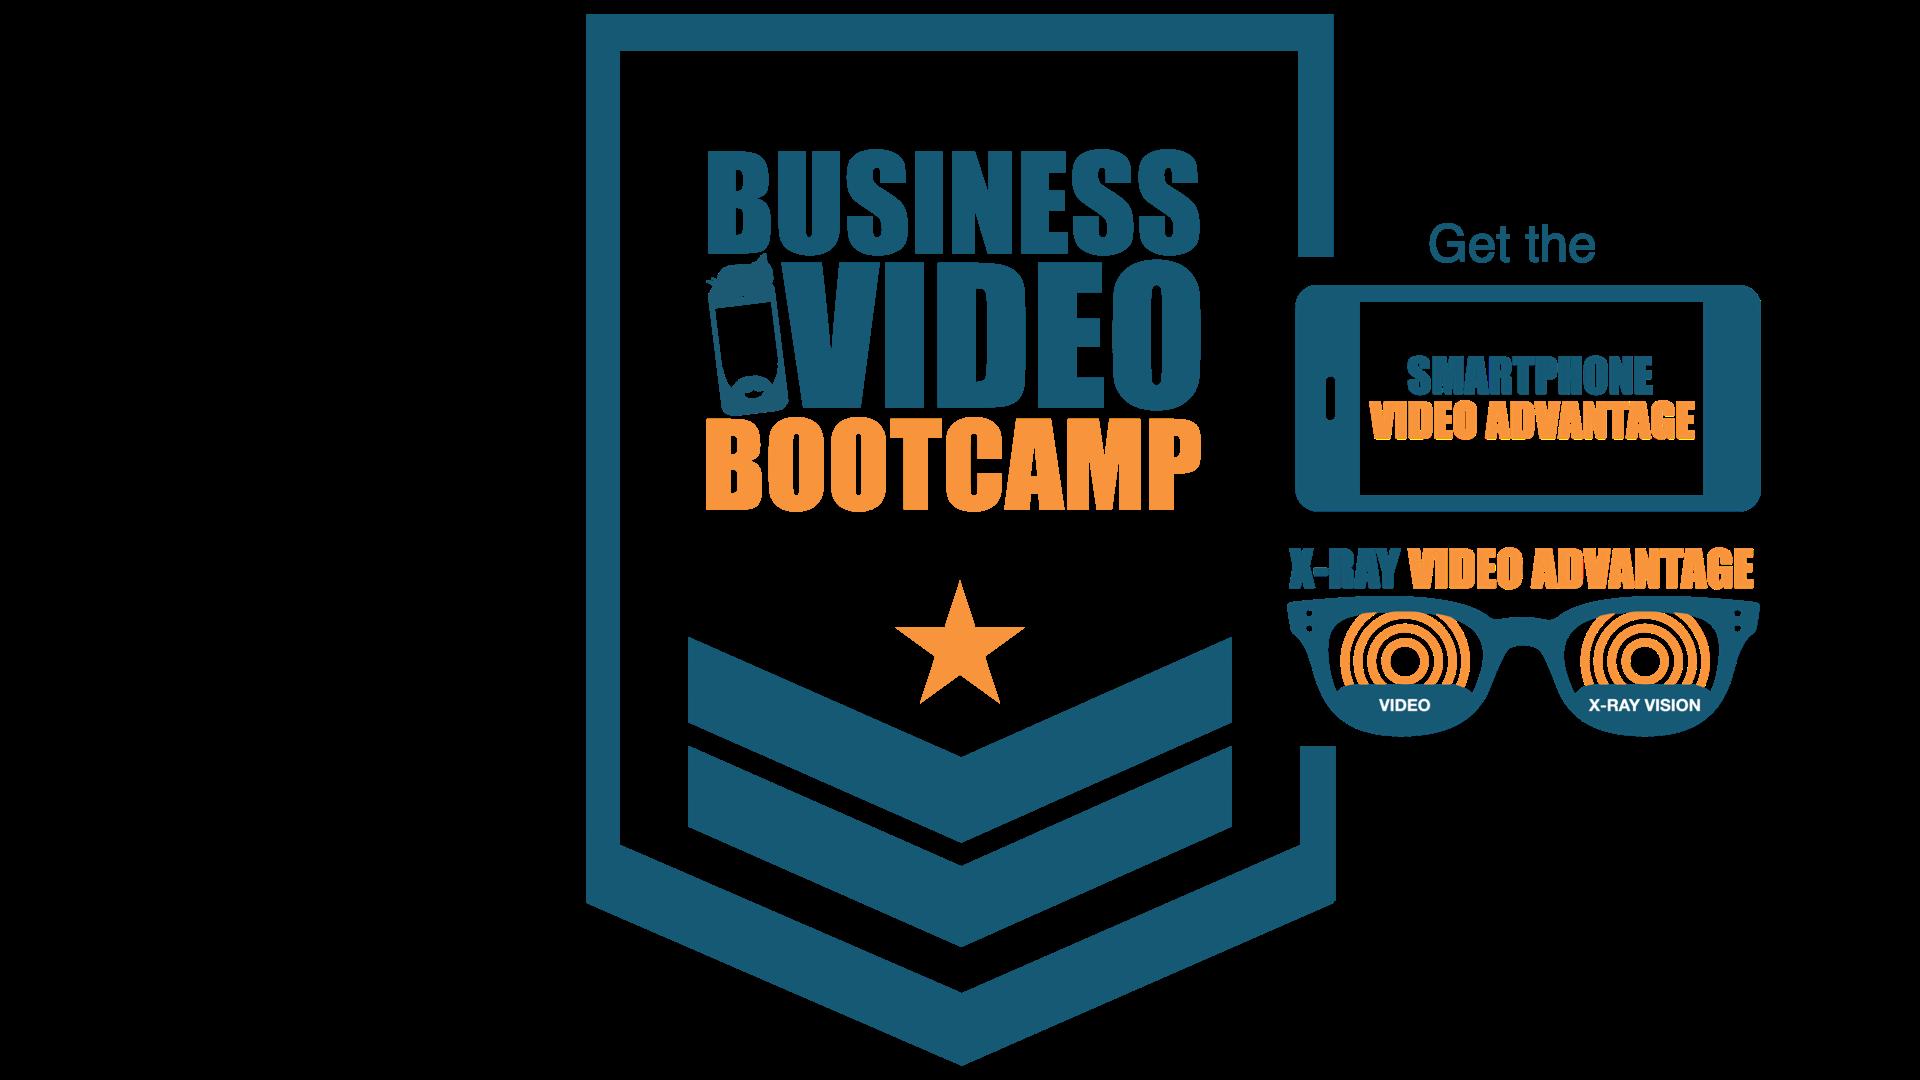 Onsite Video Workshops for Business Corporate Government SME Workshop Presenter on Video Skills